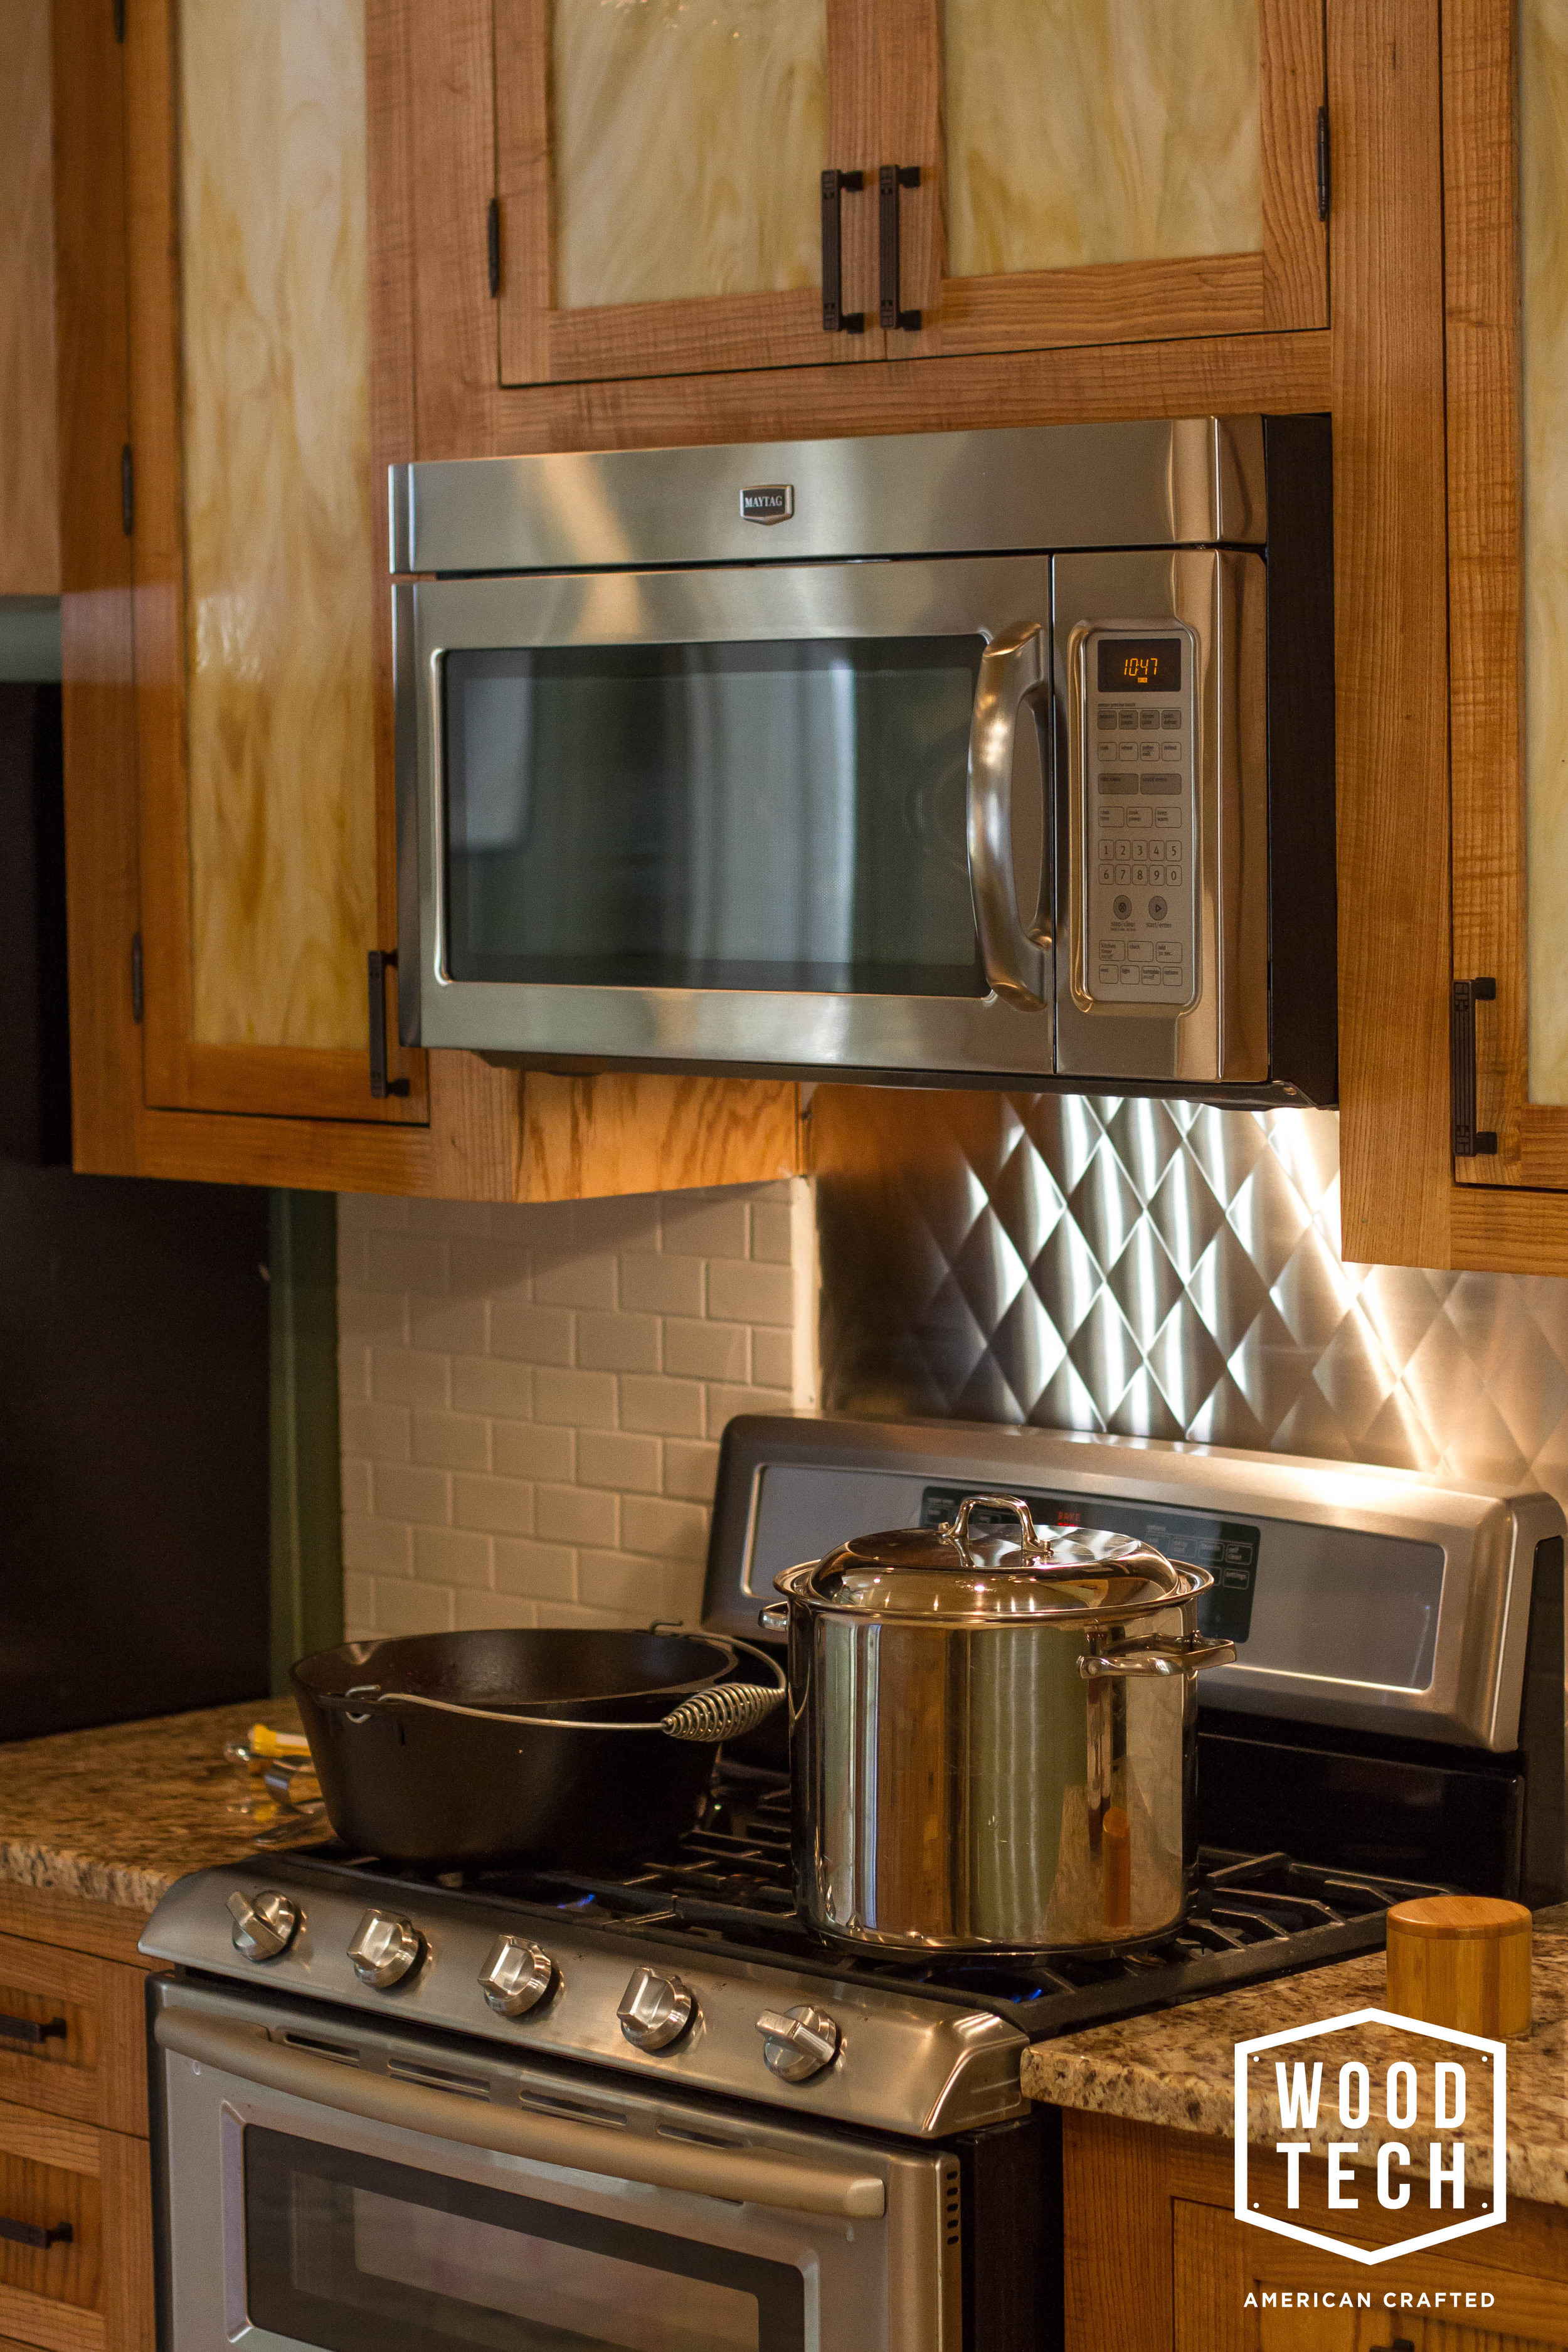 Custom Wood Cabinets with Microwave